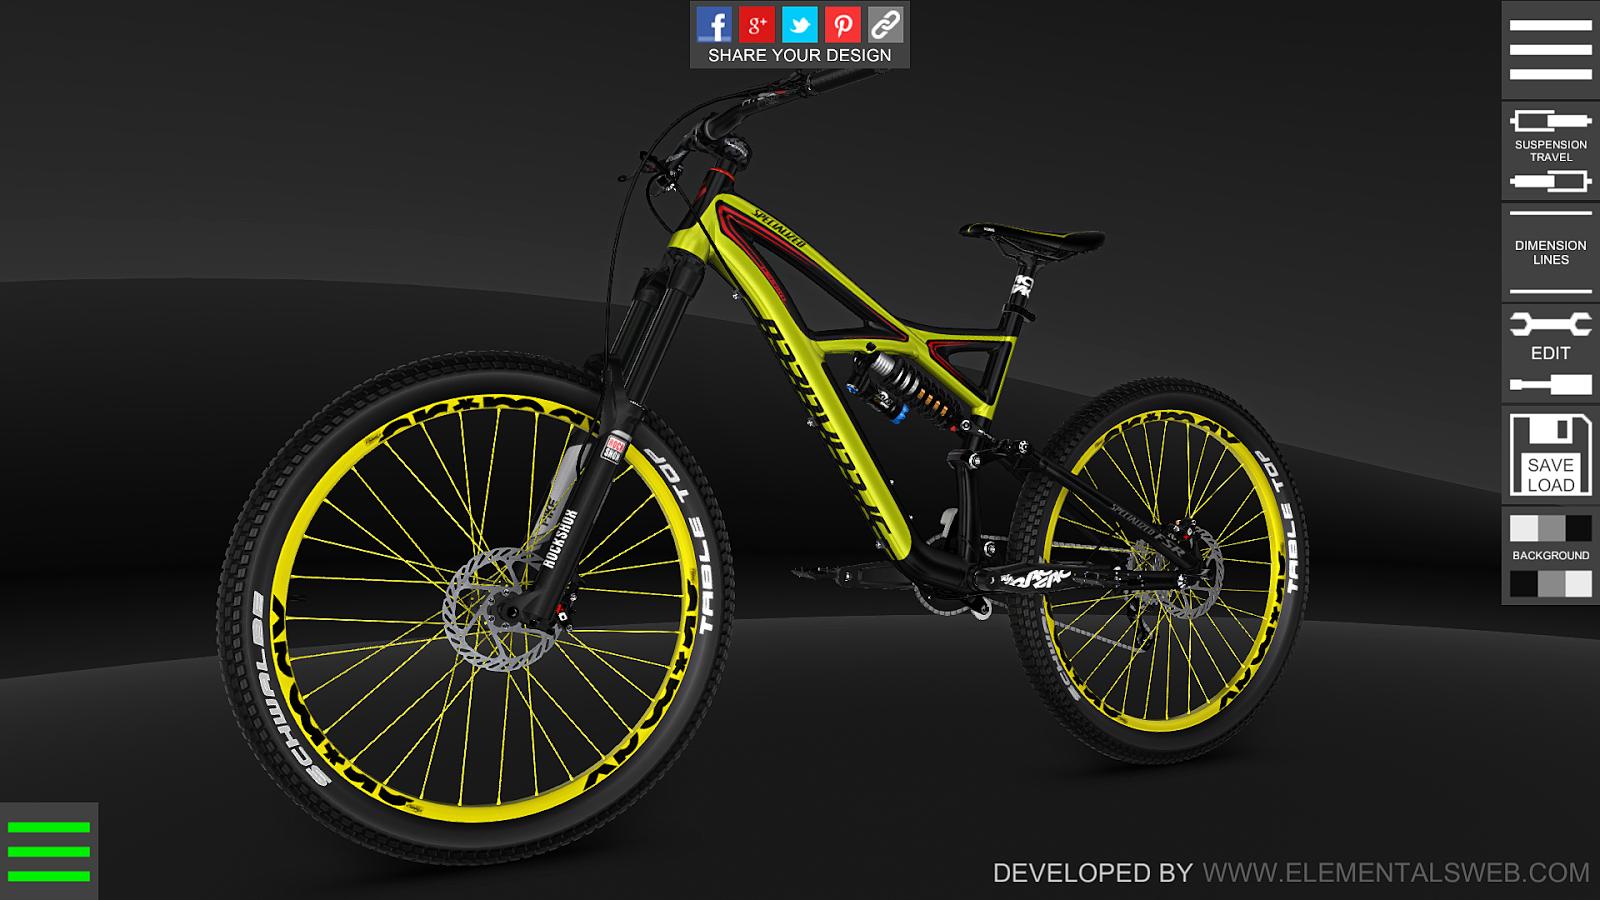 Bike Modification Software Windows7 For Pc - xilusbeautiful